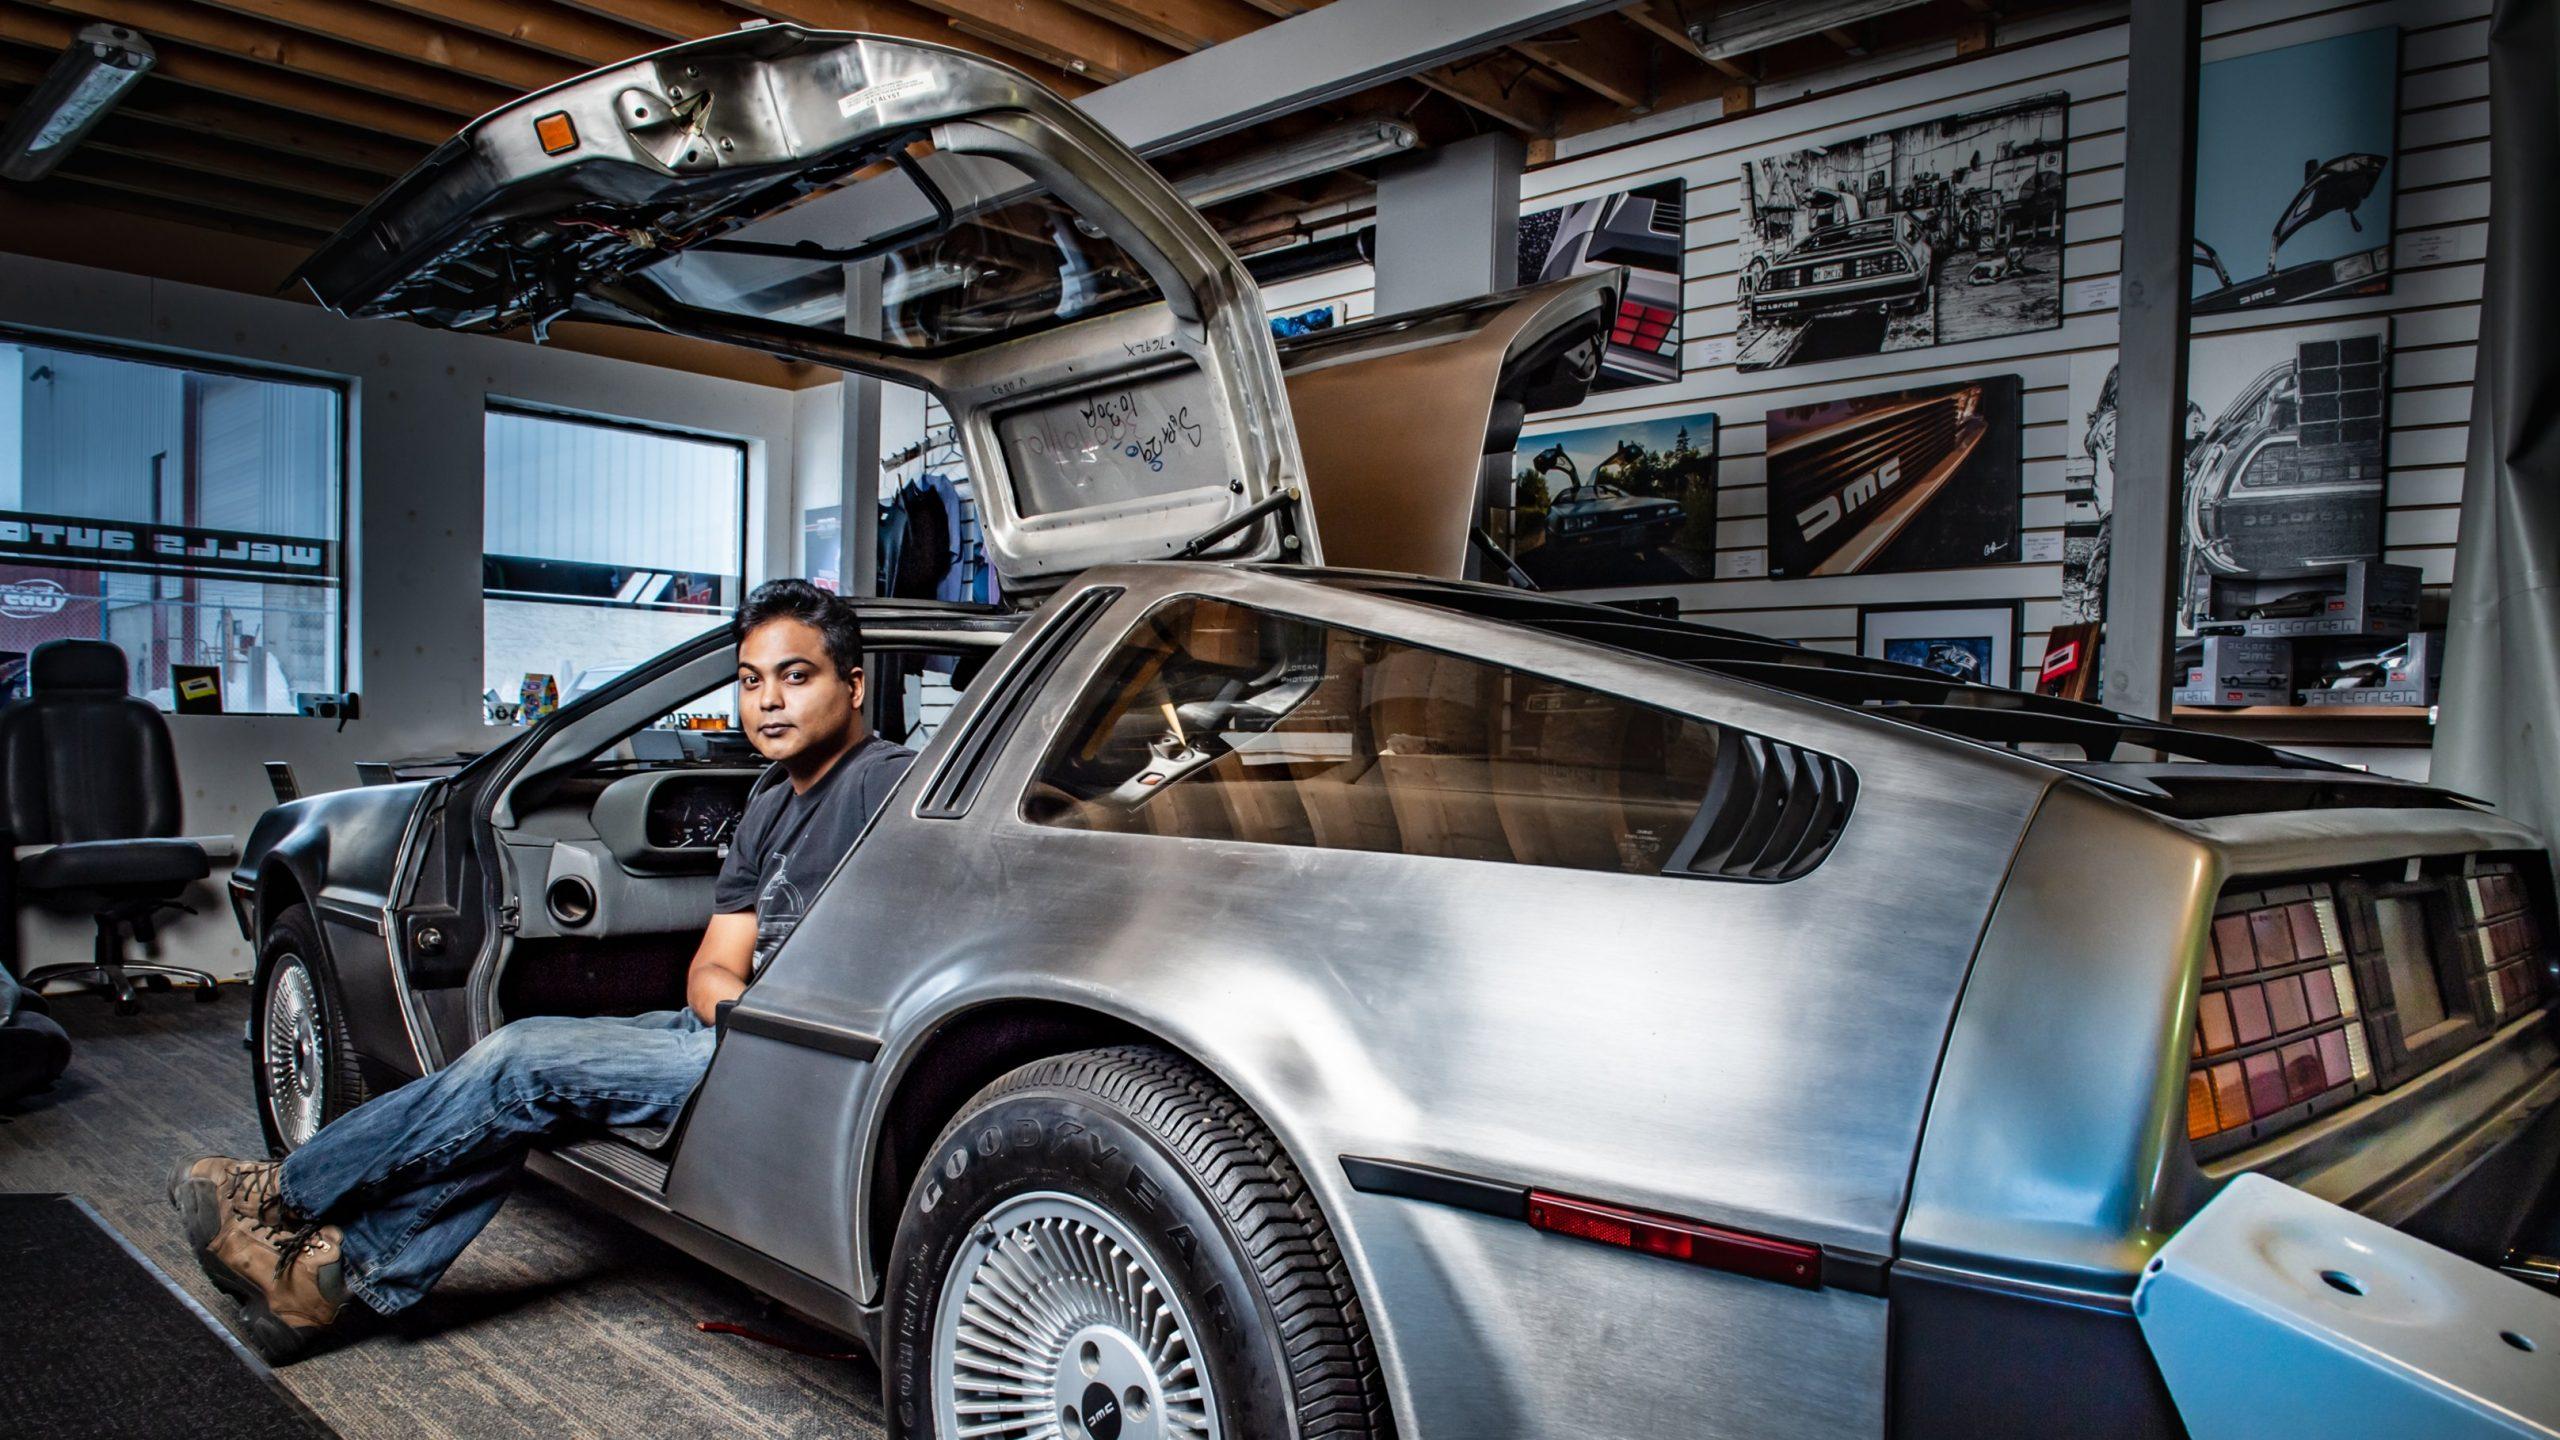 Restoring DeLorean